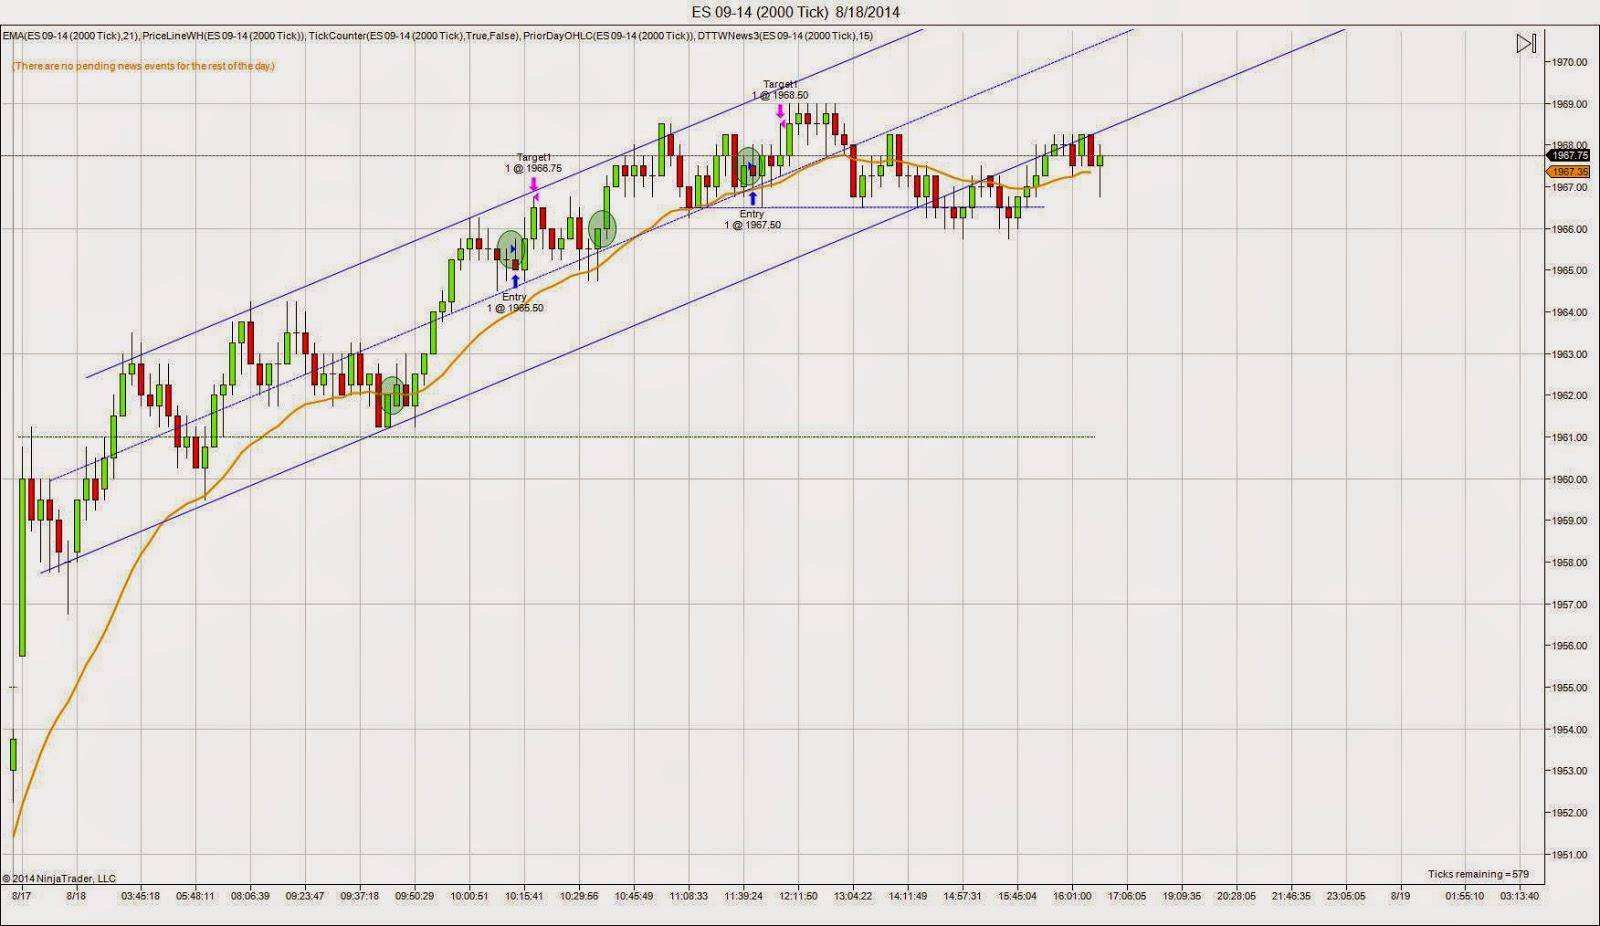 E-mini S&P 500 Futures chart for Monday 8/18/14